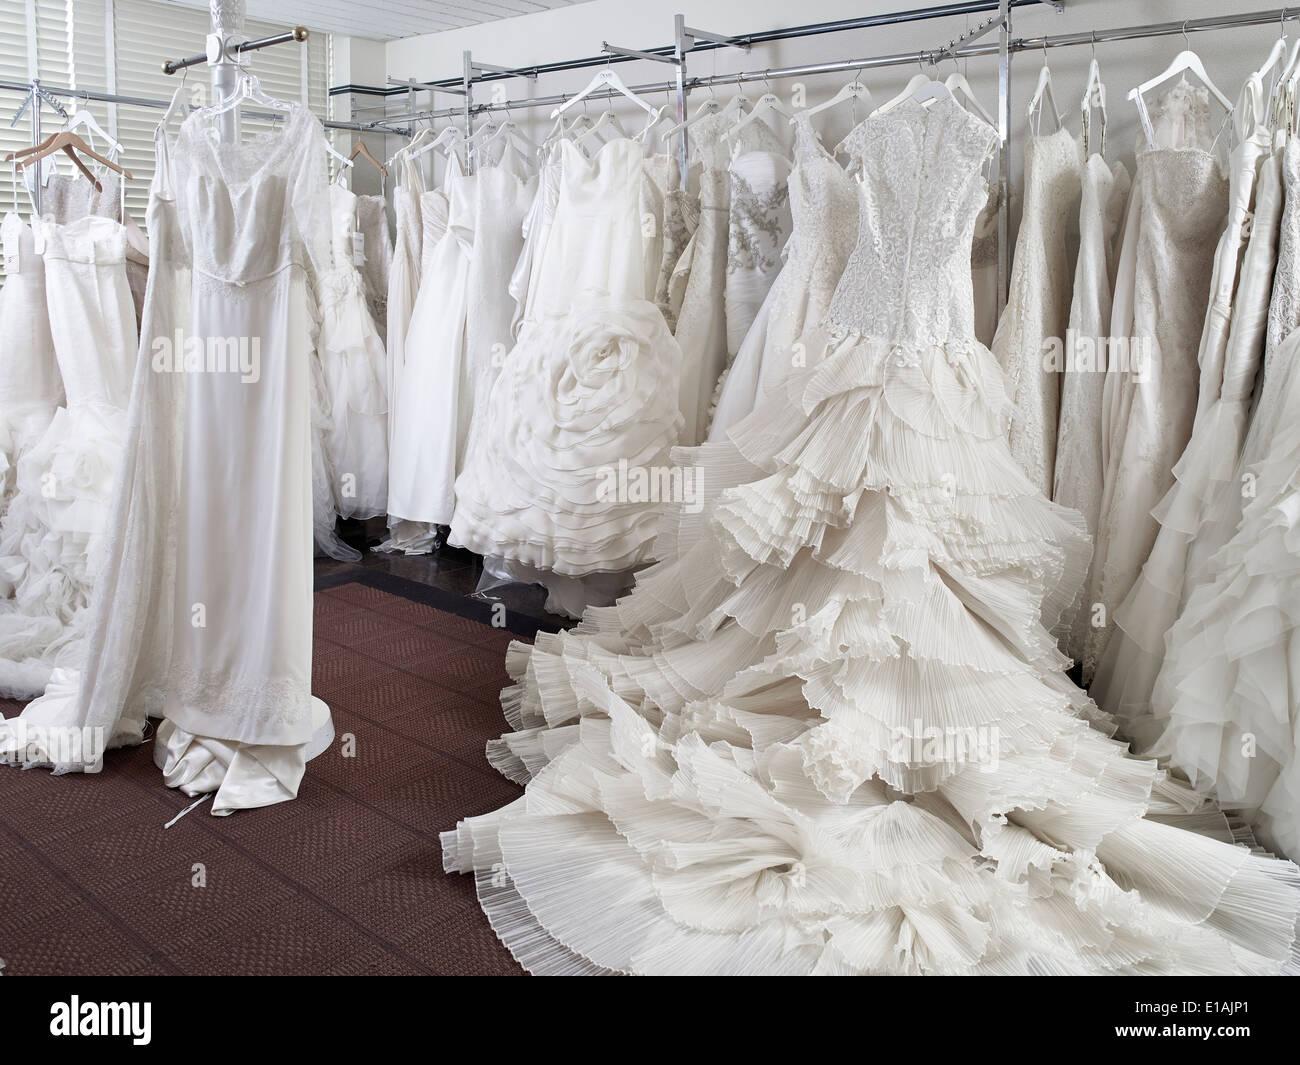 Bridesmaid Dresses in Stock